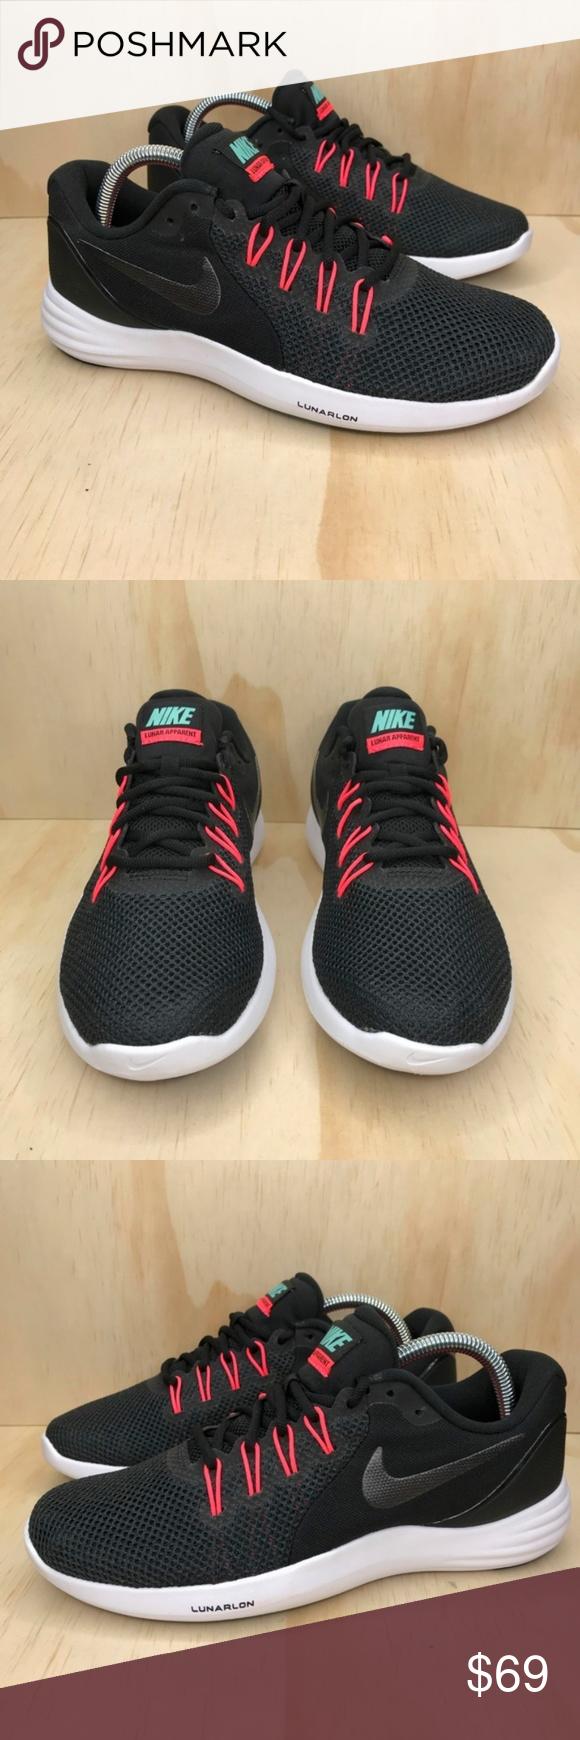 NEW Nike Lunar Apparent Black Solar Red